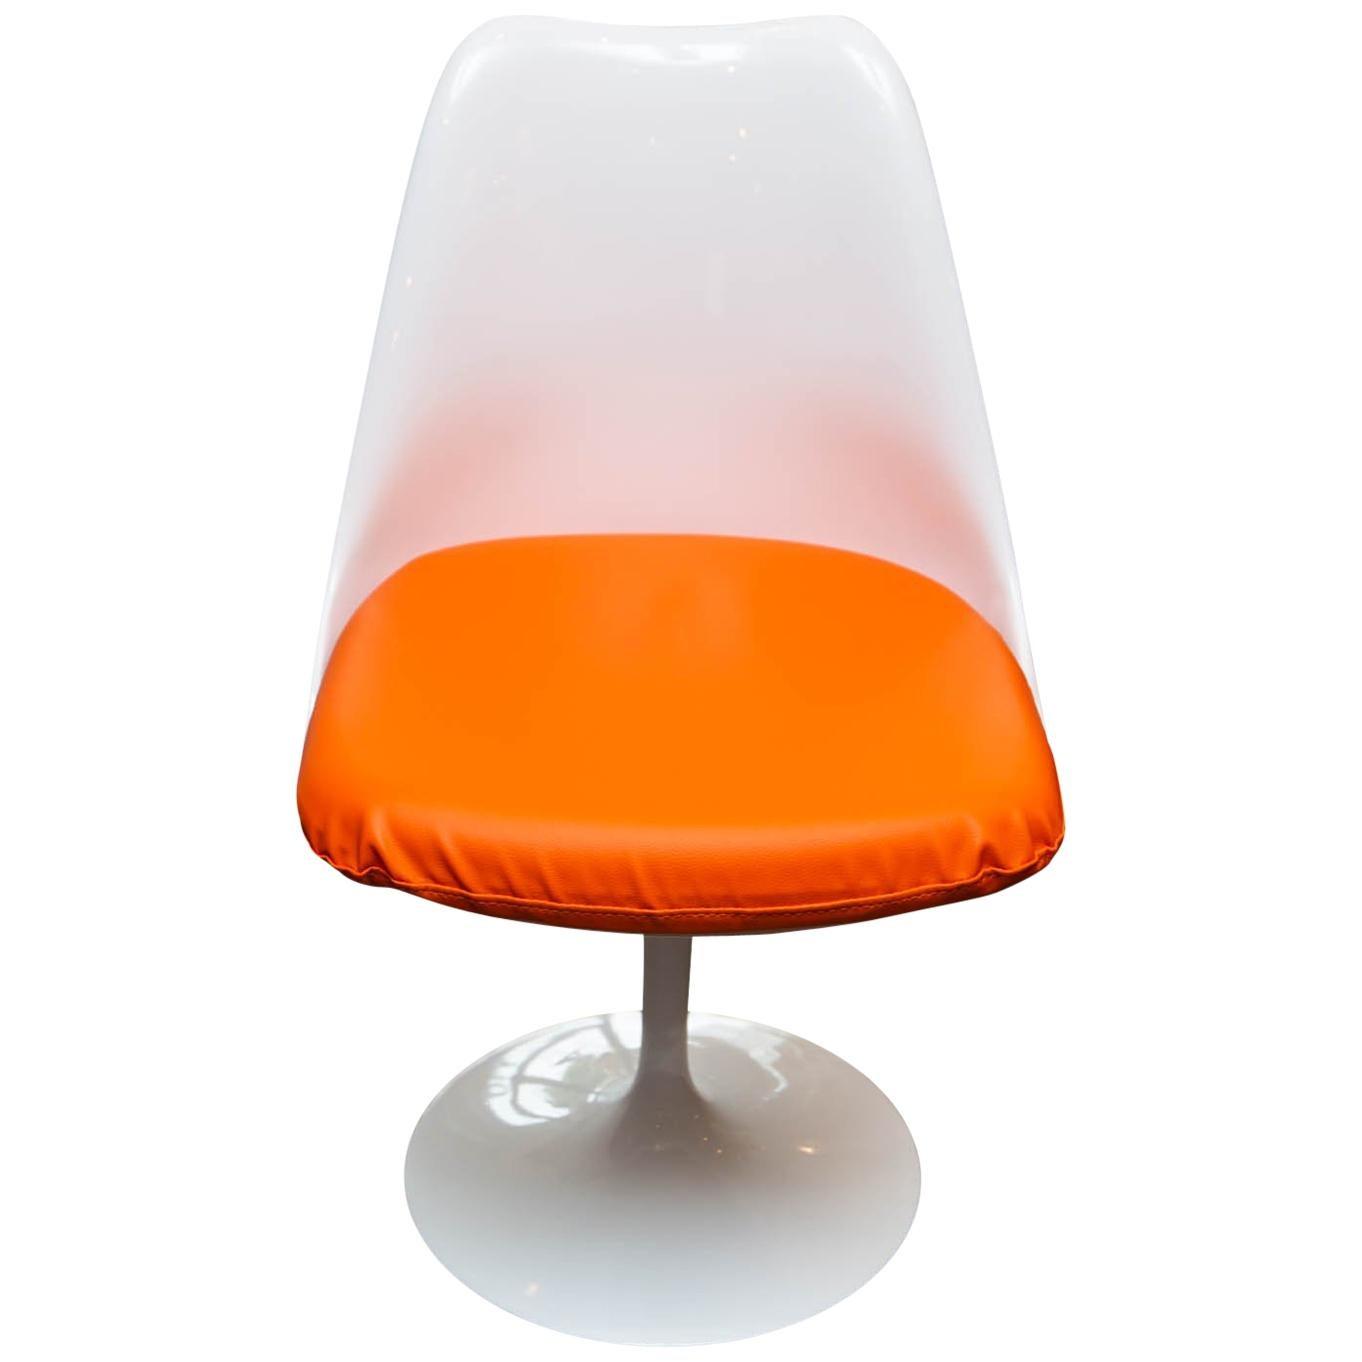 Set Of Six Eero Saarinen Tulip Chairs For Knoll